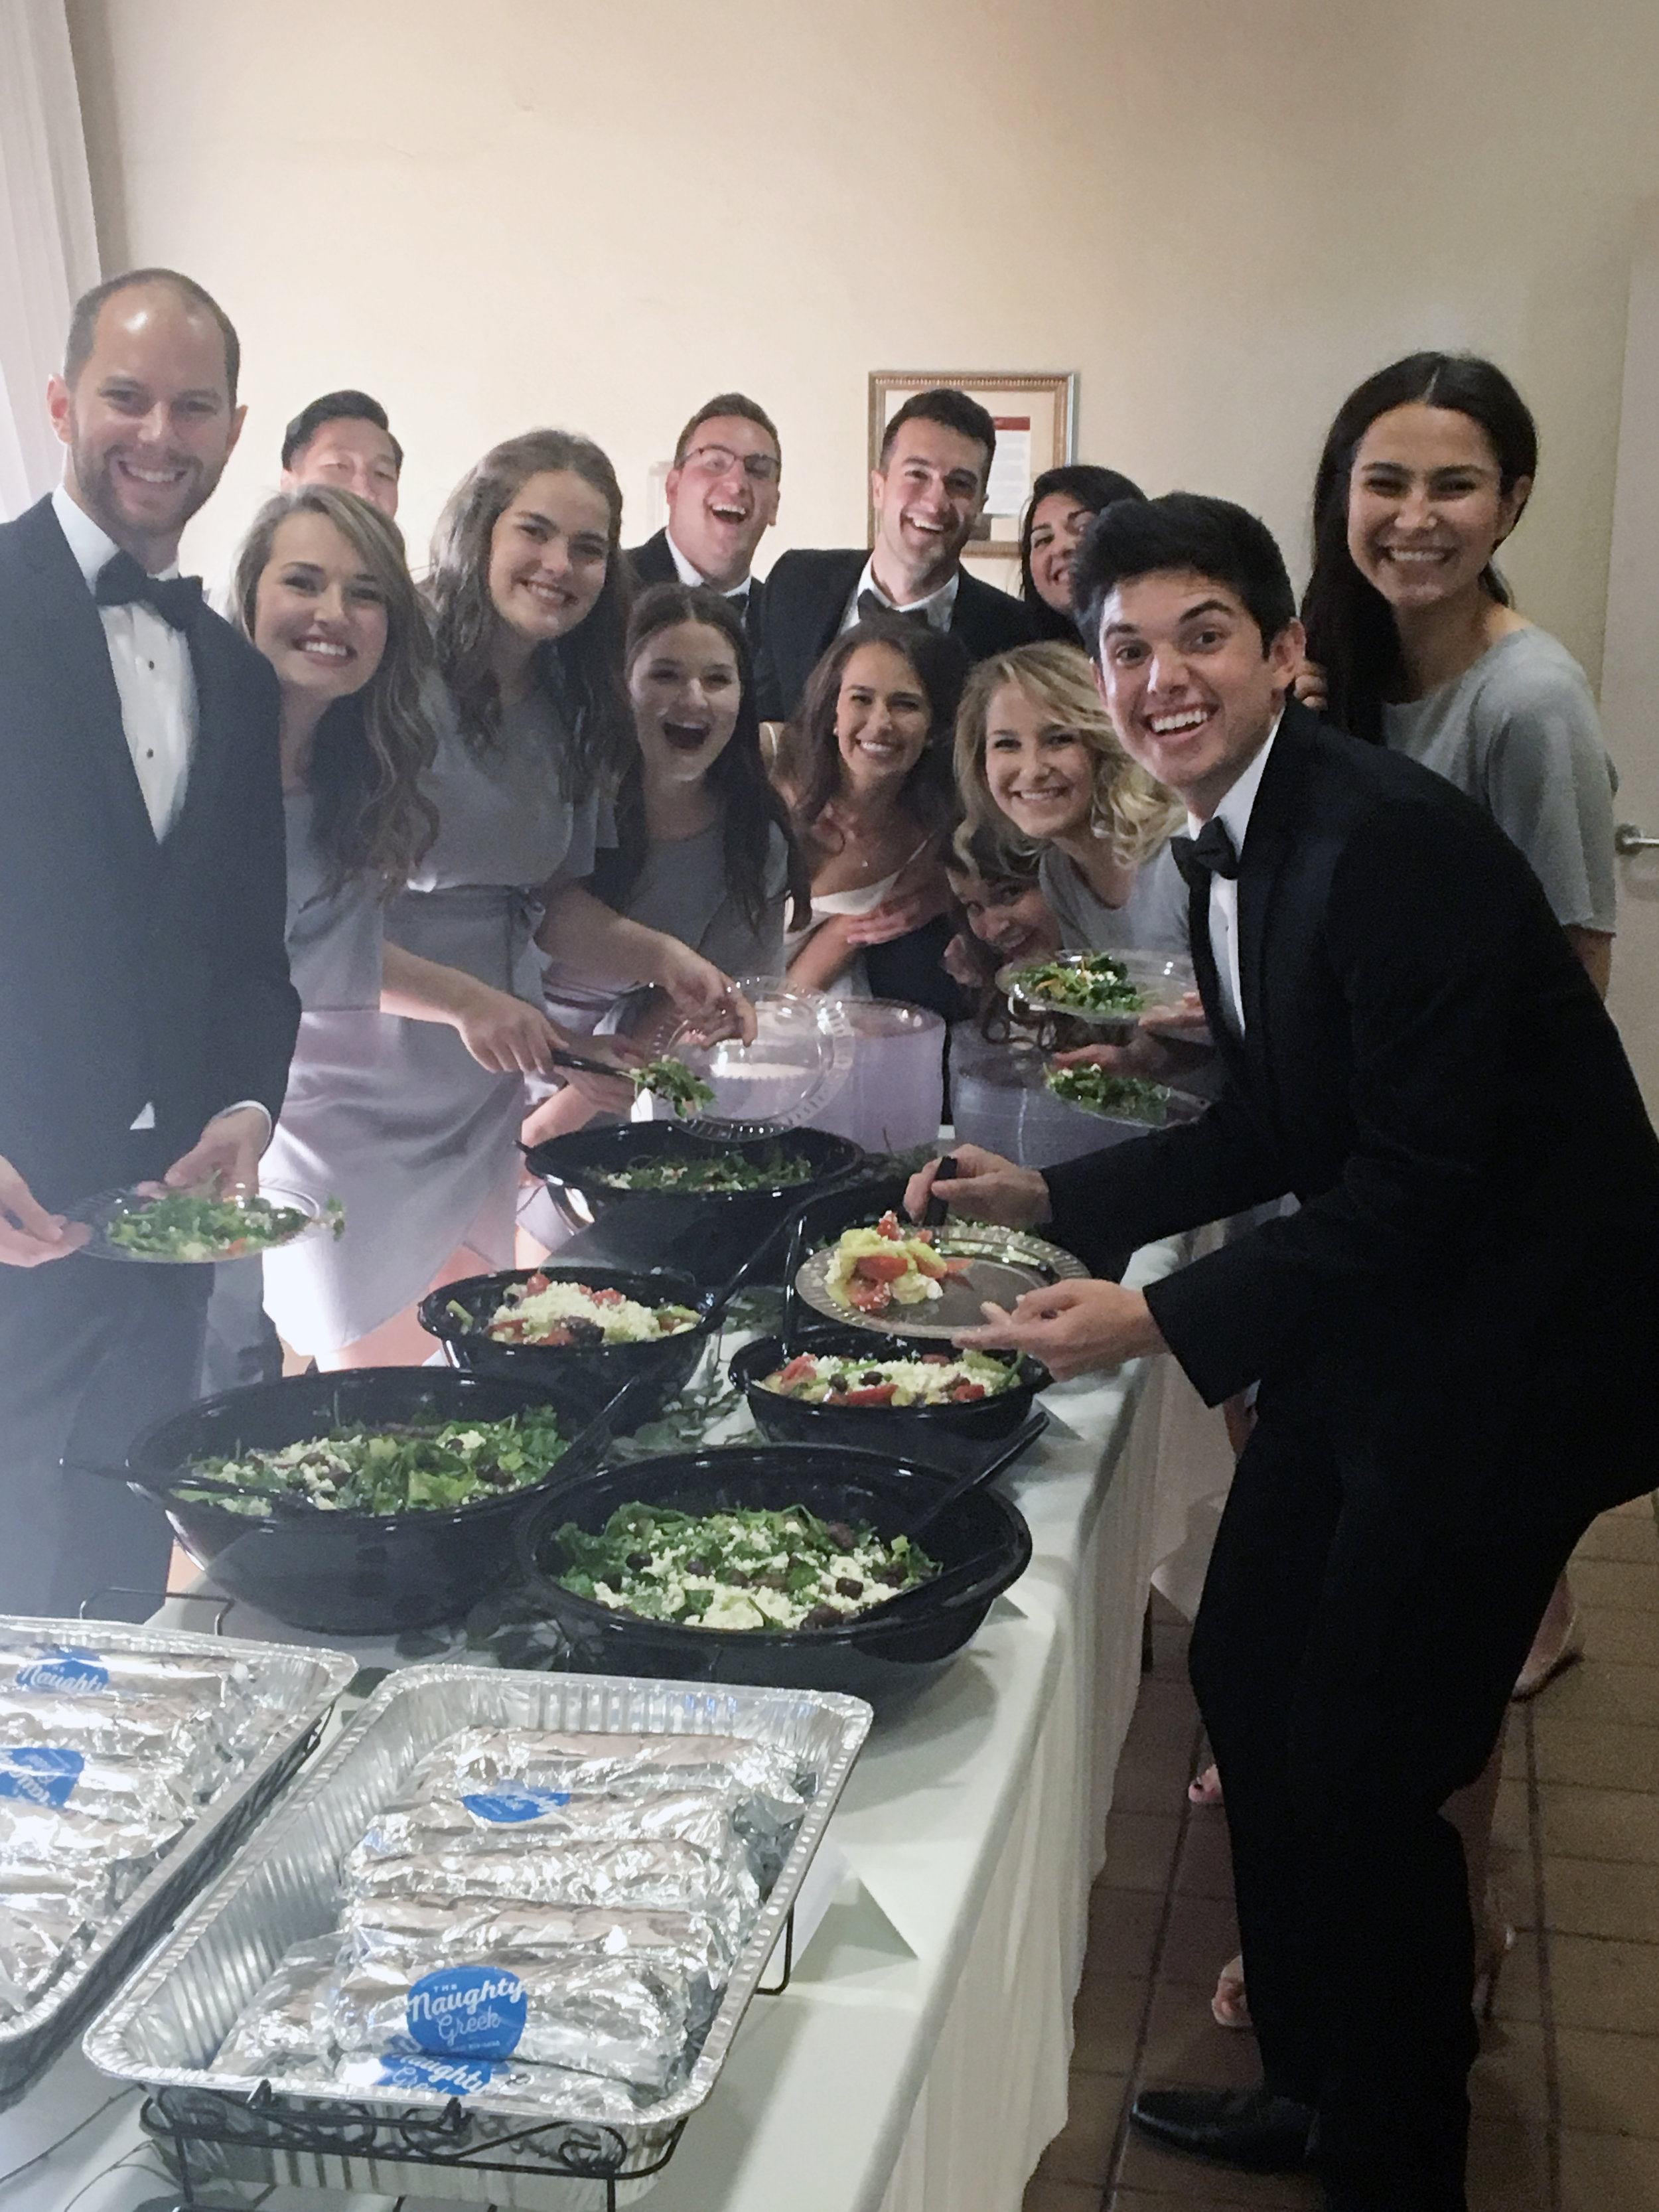 The_Naughty_Greek_Wedding_Gyros.JPG